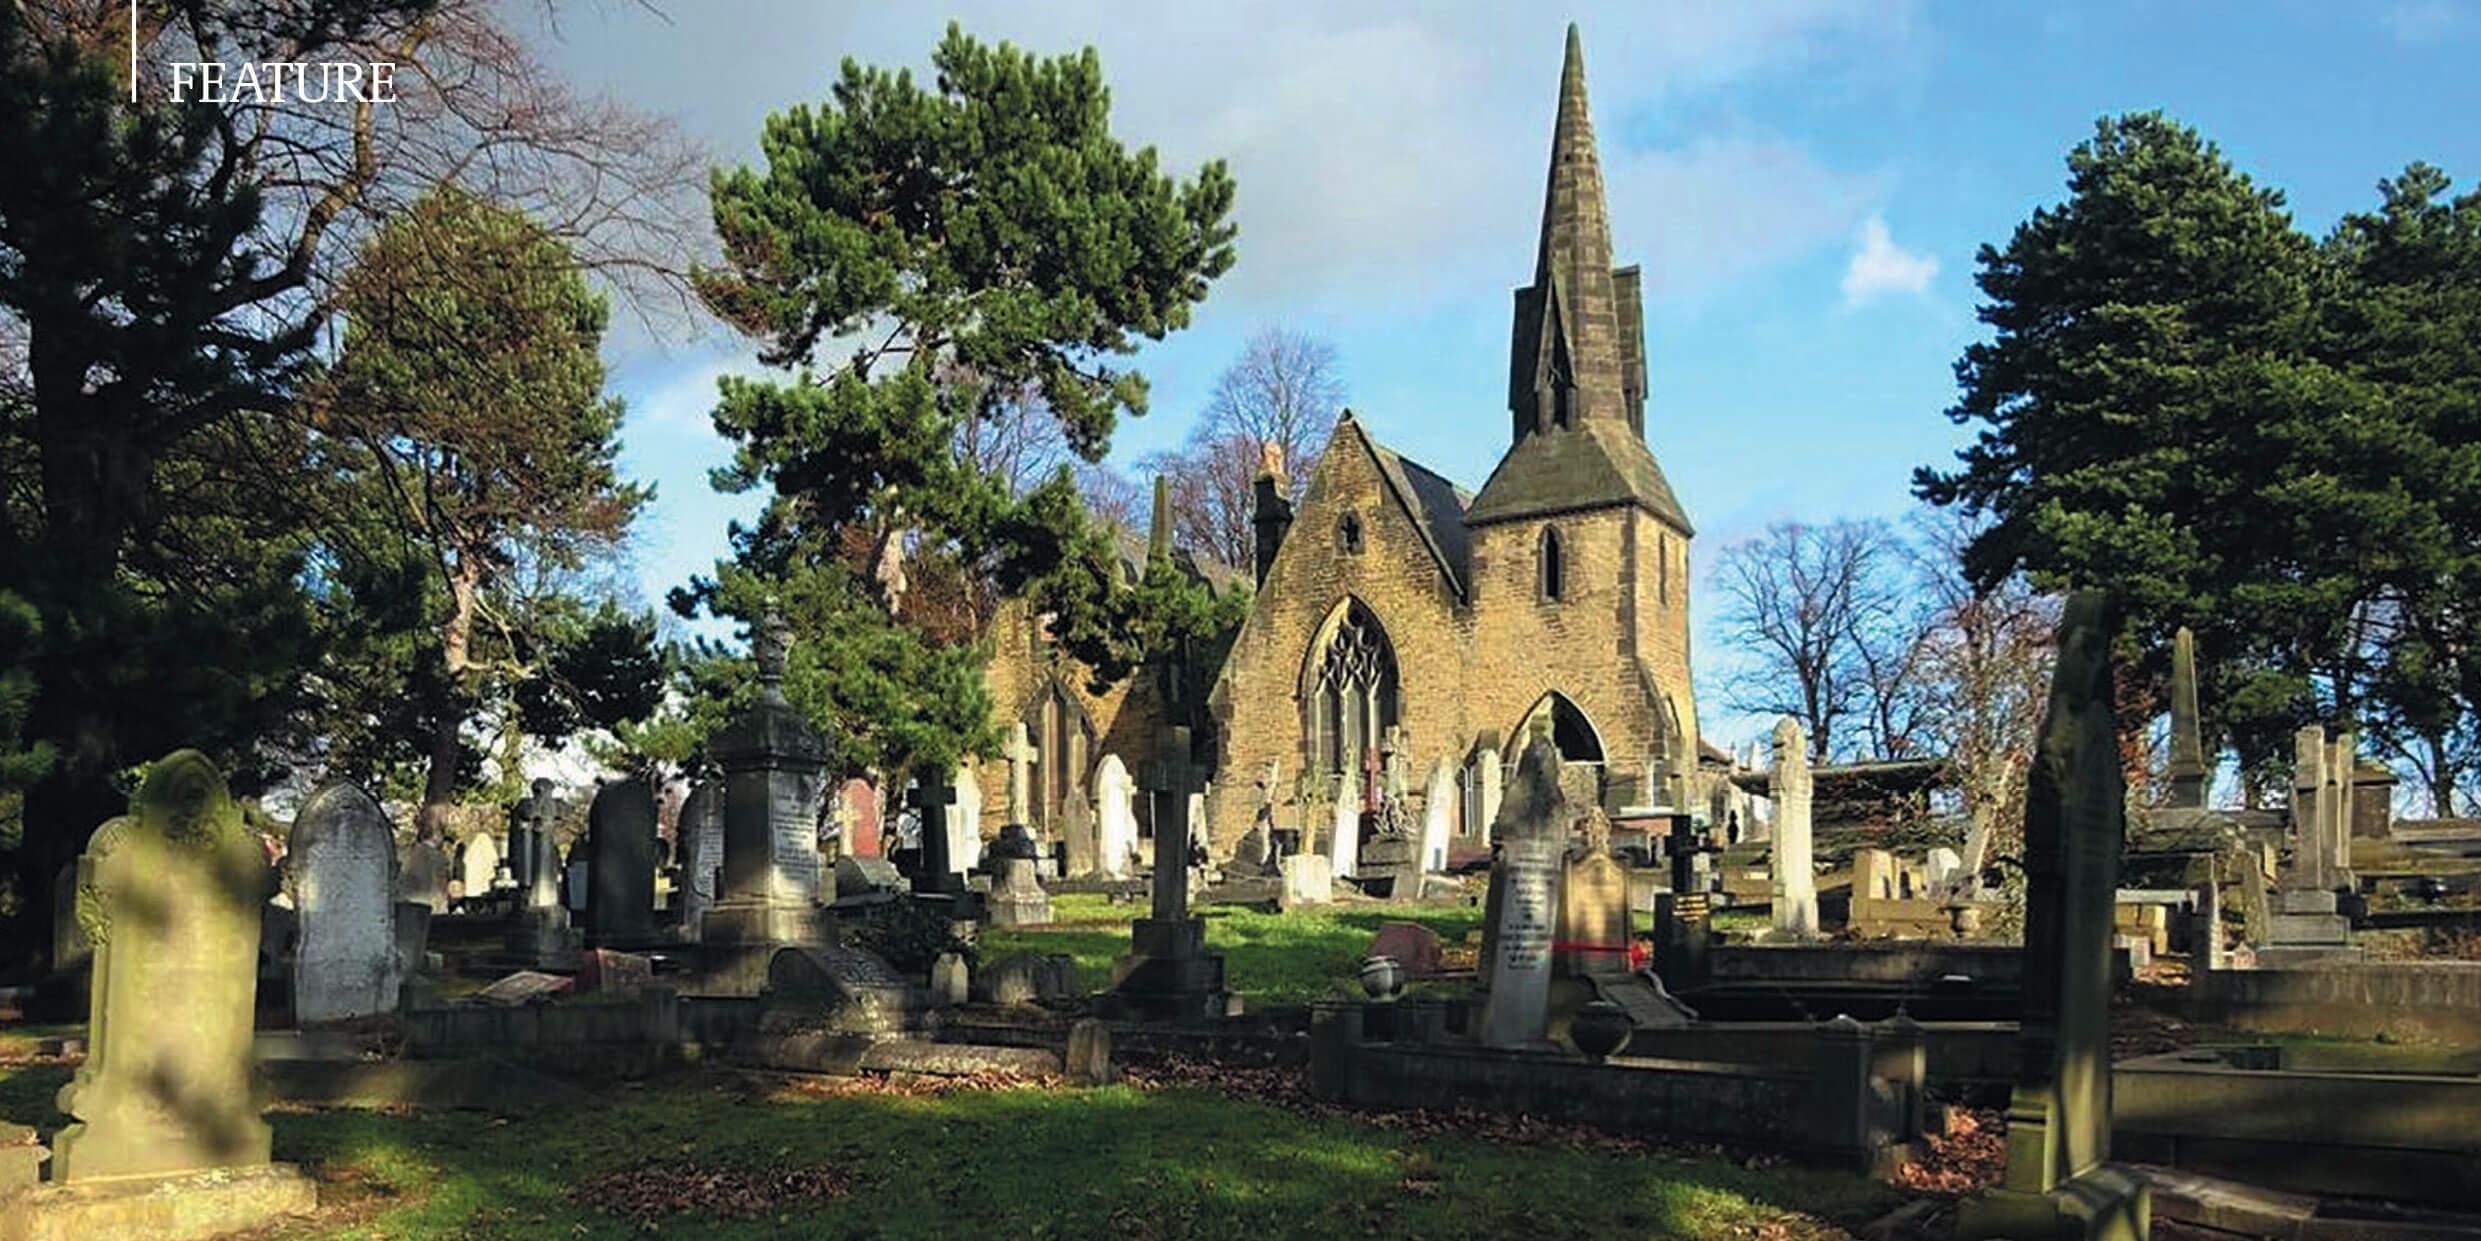 Spital Cemetery